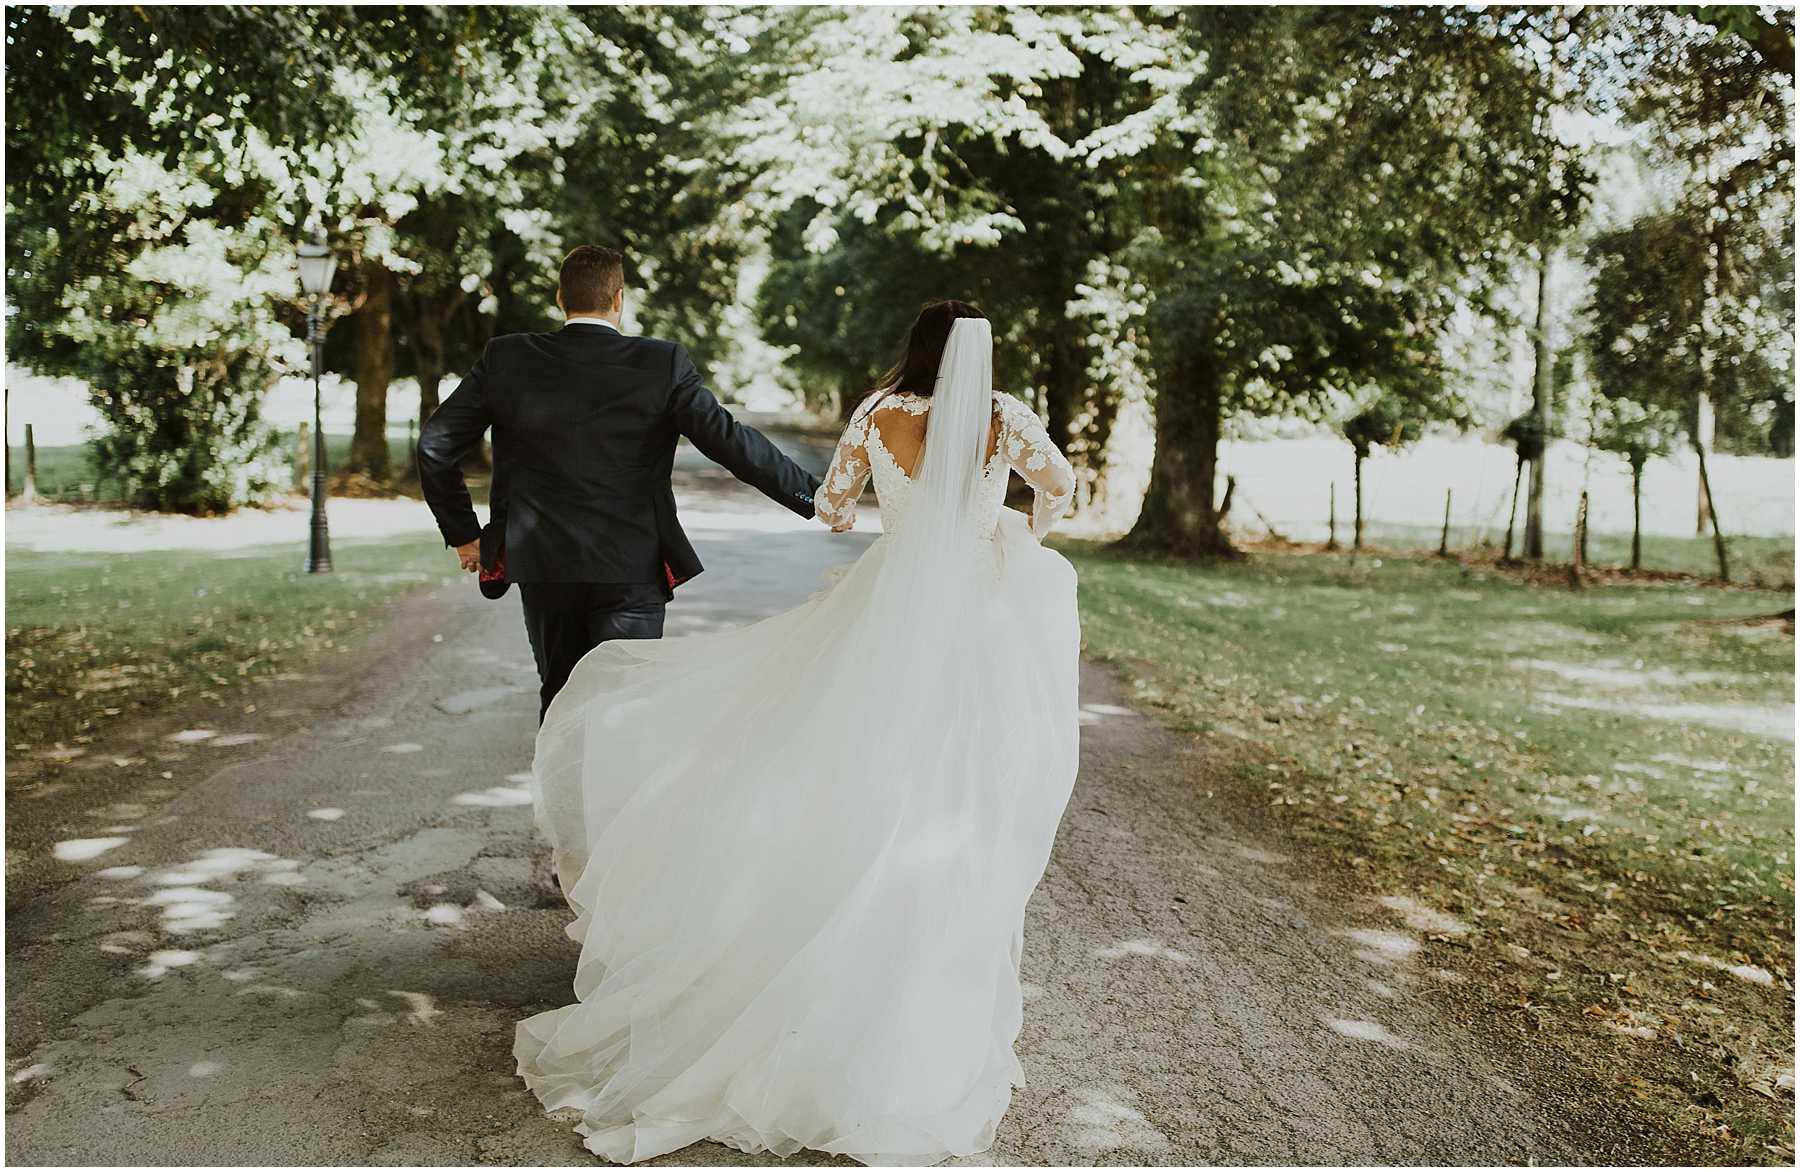 Intimate Wedding at the Gap of Dunloe in Ireland